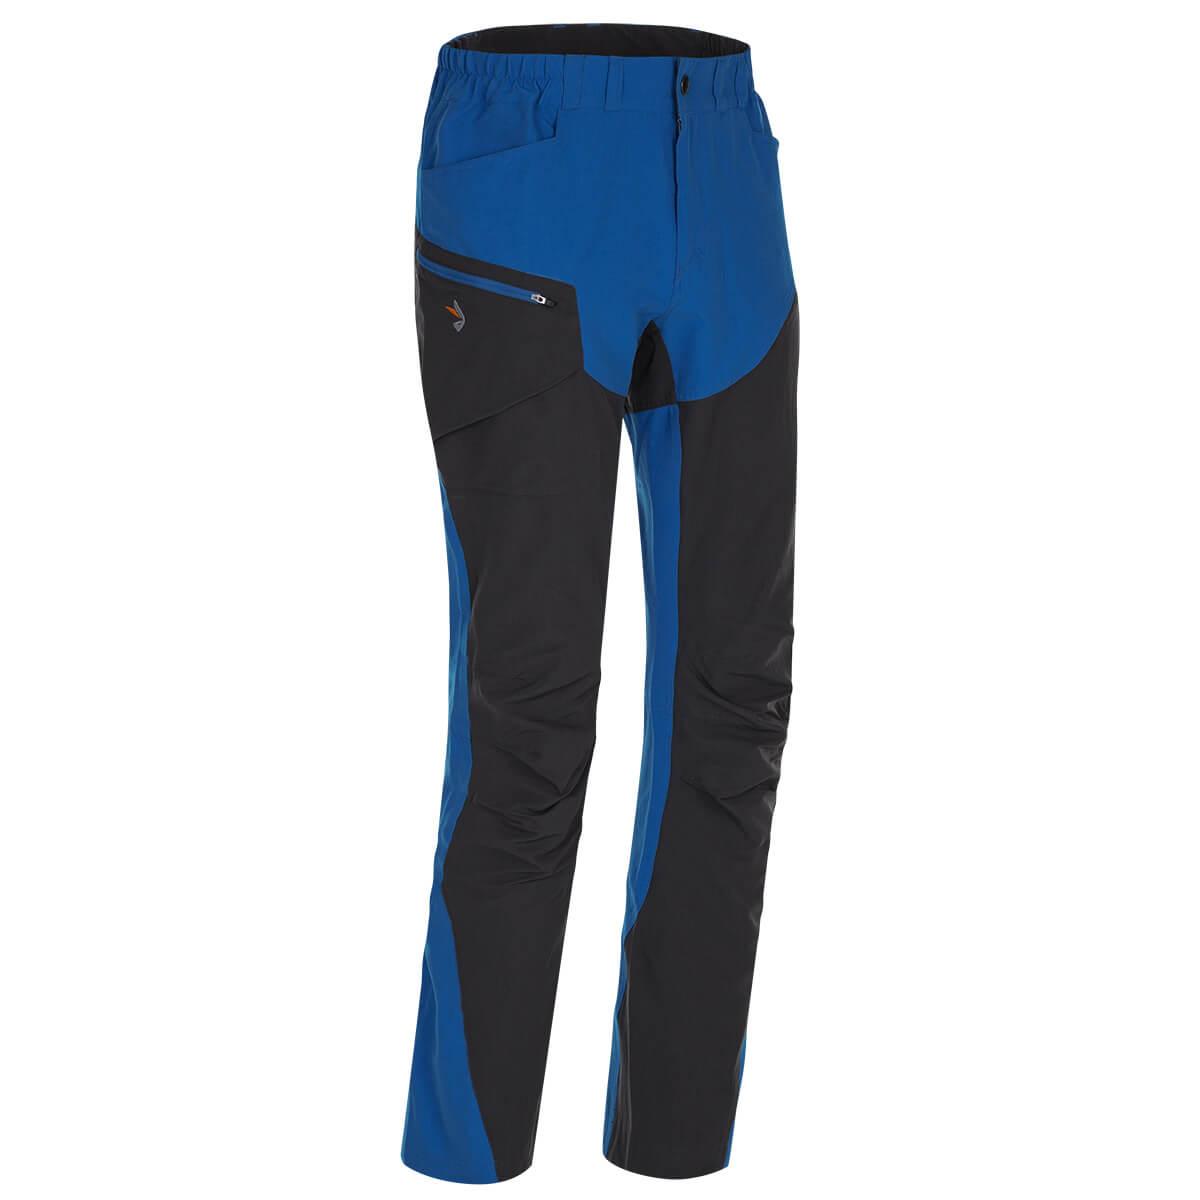 Nohavice Zajo Magnet Neo Pants Blue - veľkosť M